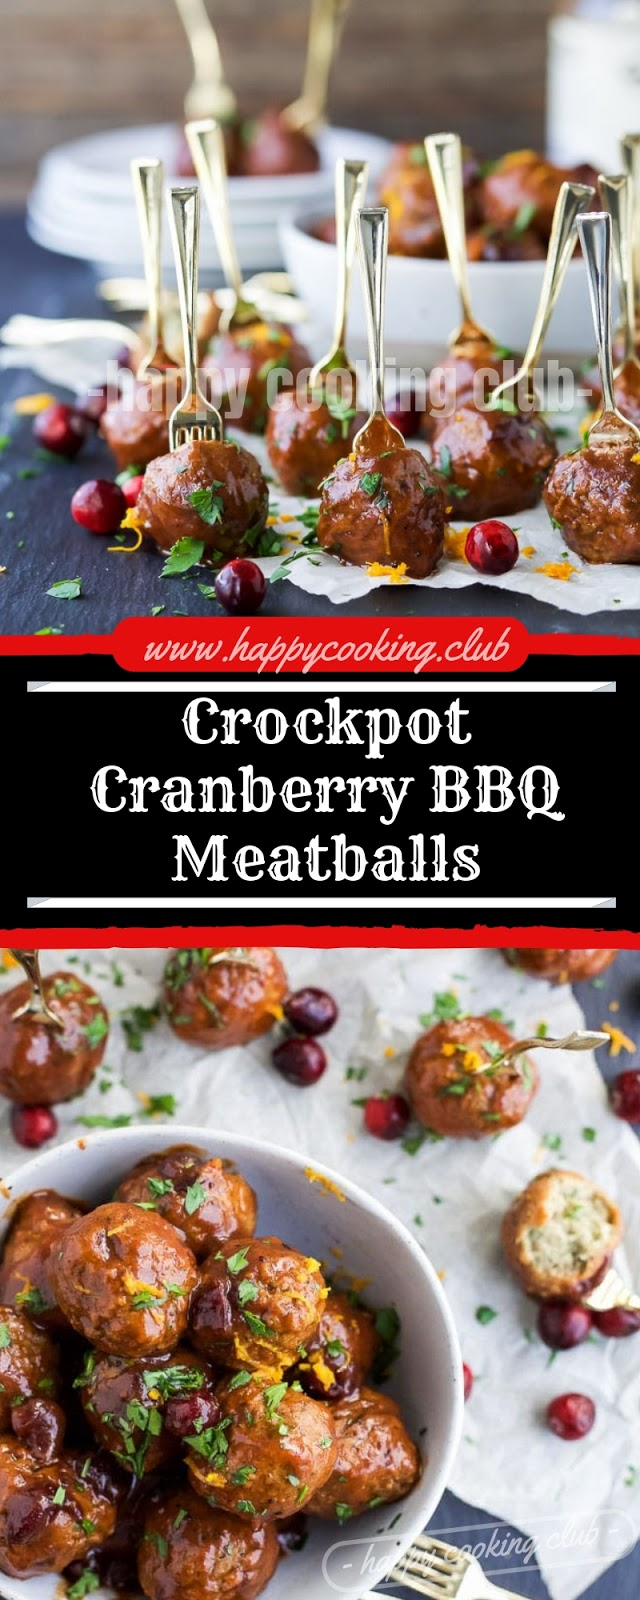 Crockpot Cranberry BBQ Meatballs